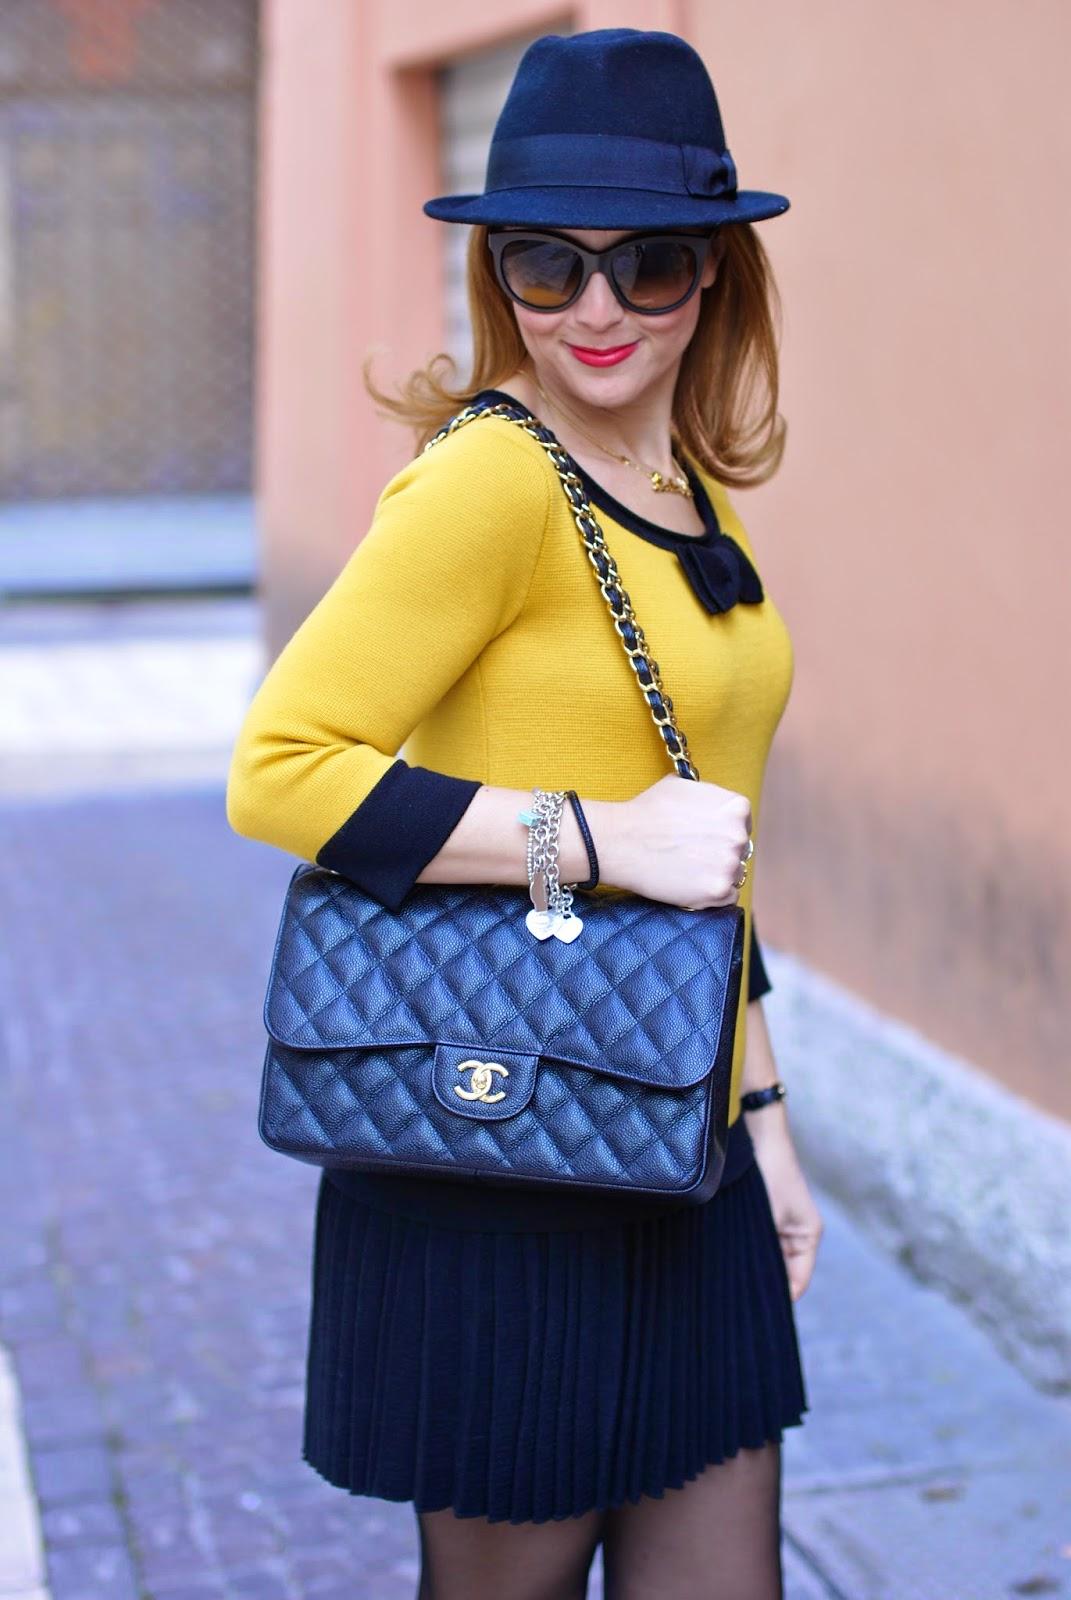 twin-set simona barbieri dress, short dress with black sheer tights, fedora H&M, Chanel 2.55 classic flap, Fashion and Cookies fashion blog, fashion blogger